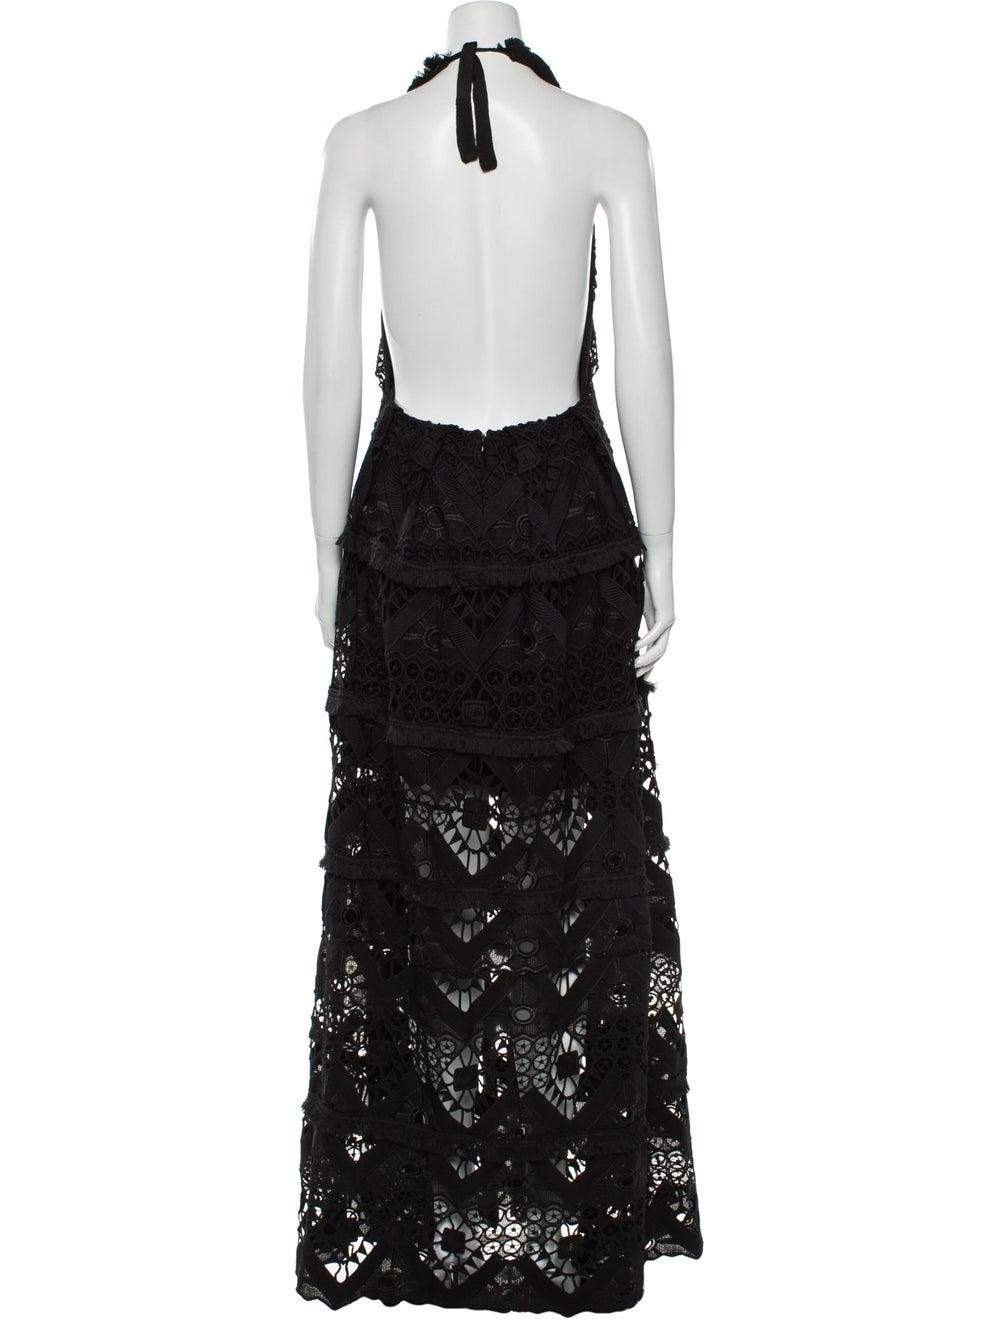 Alexis Lace Pattern Long Dress Black - image 3